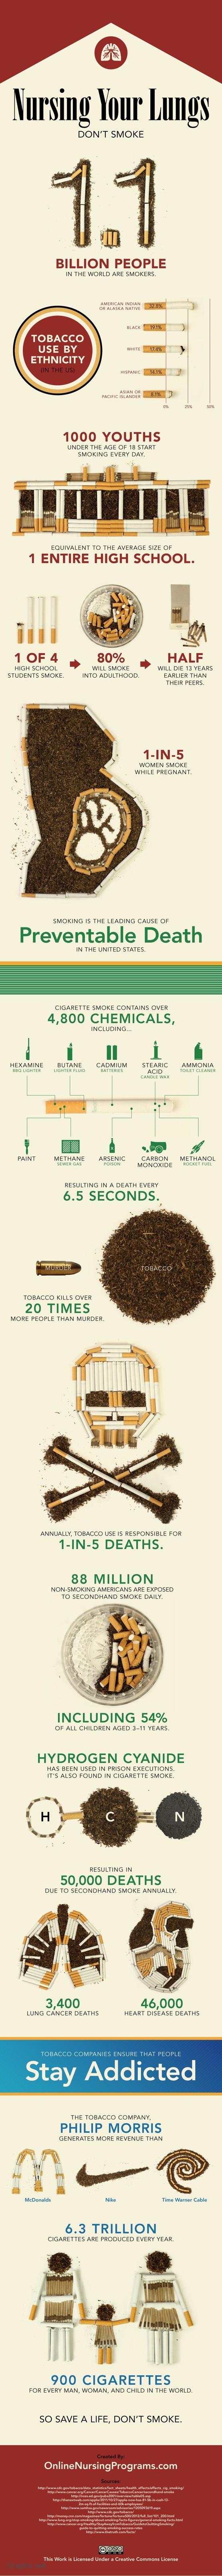 General cigarette smoking statistics